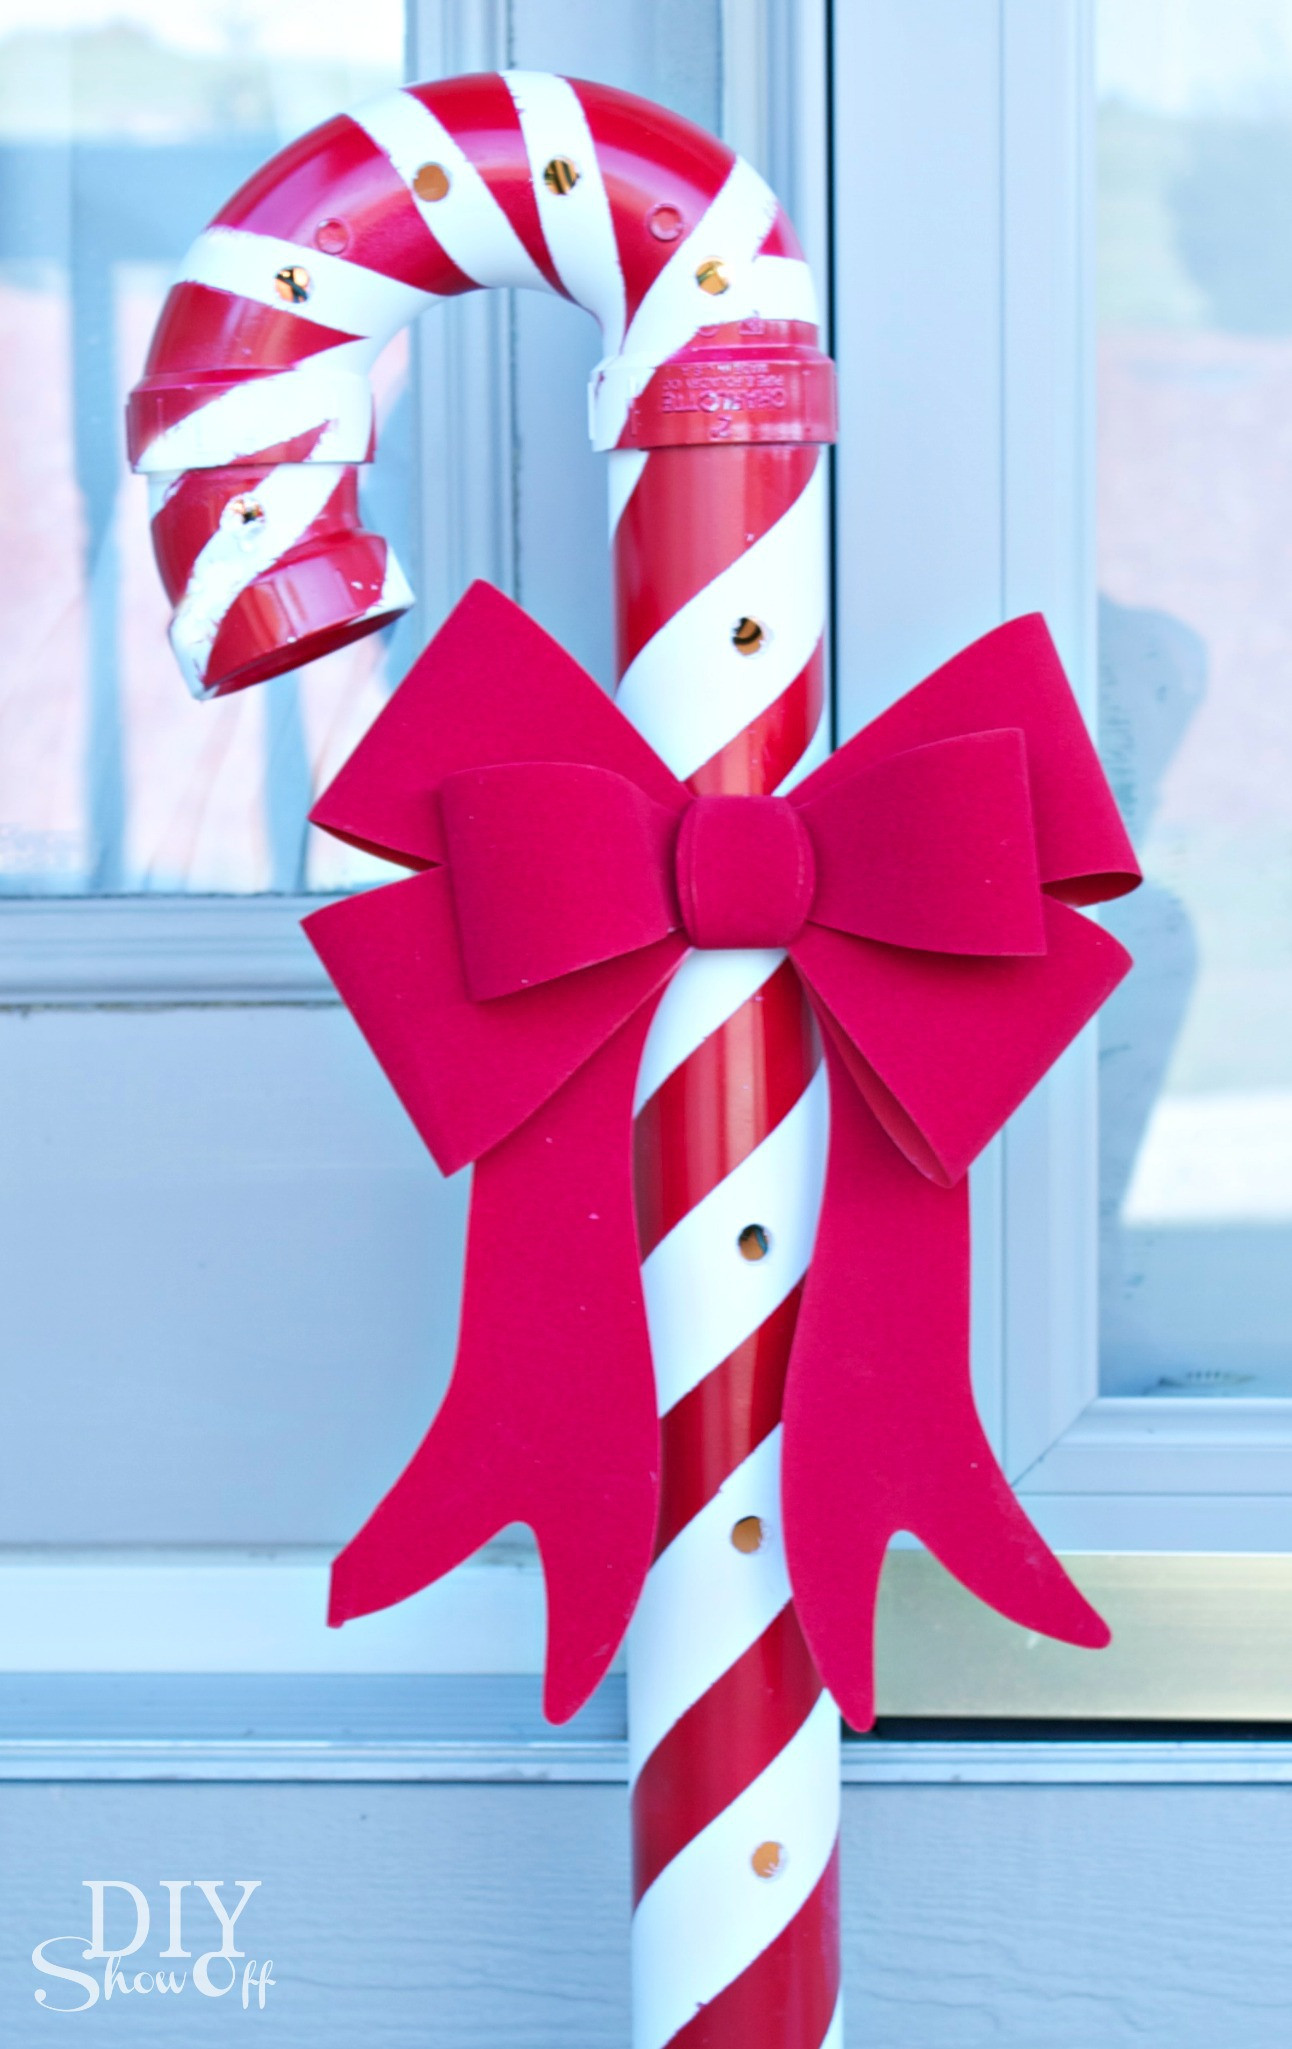 Candy Christmas Lights  Lighted PVC Candy Canes DIY Christmas Home Decor DIY